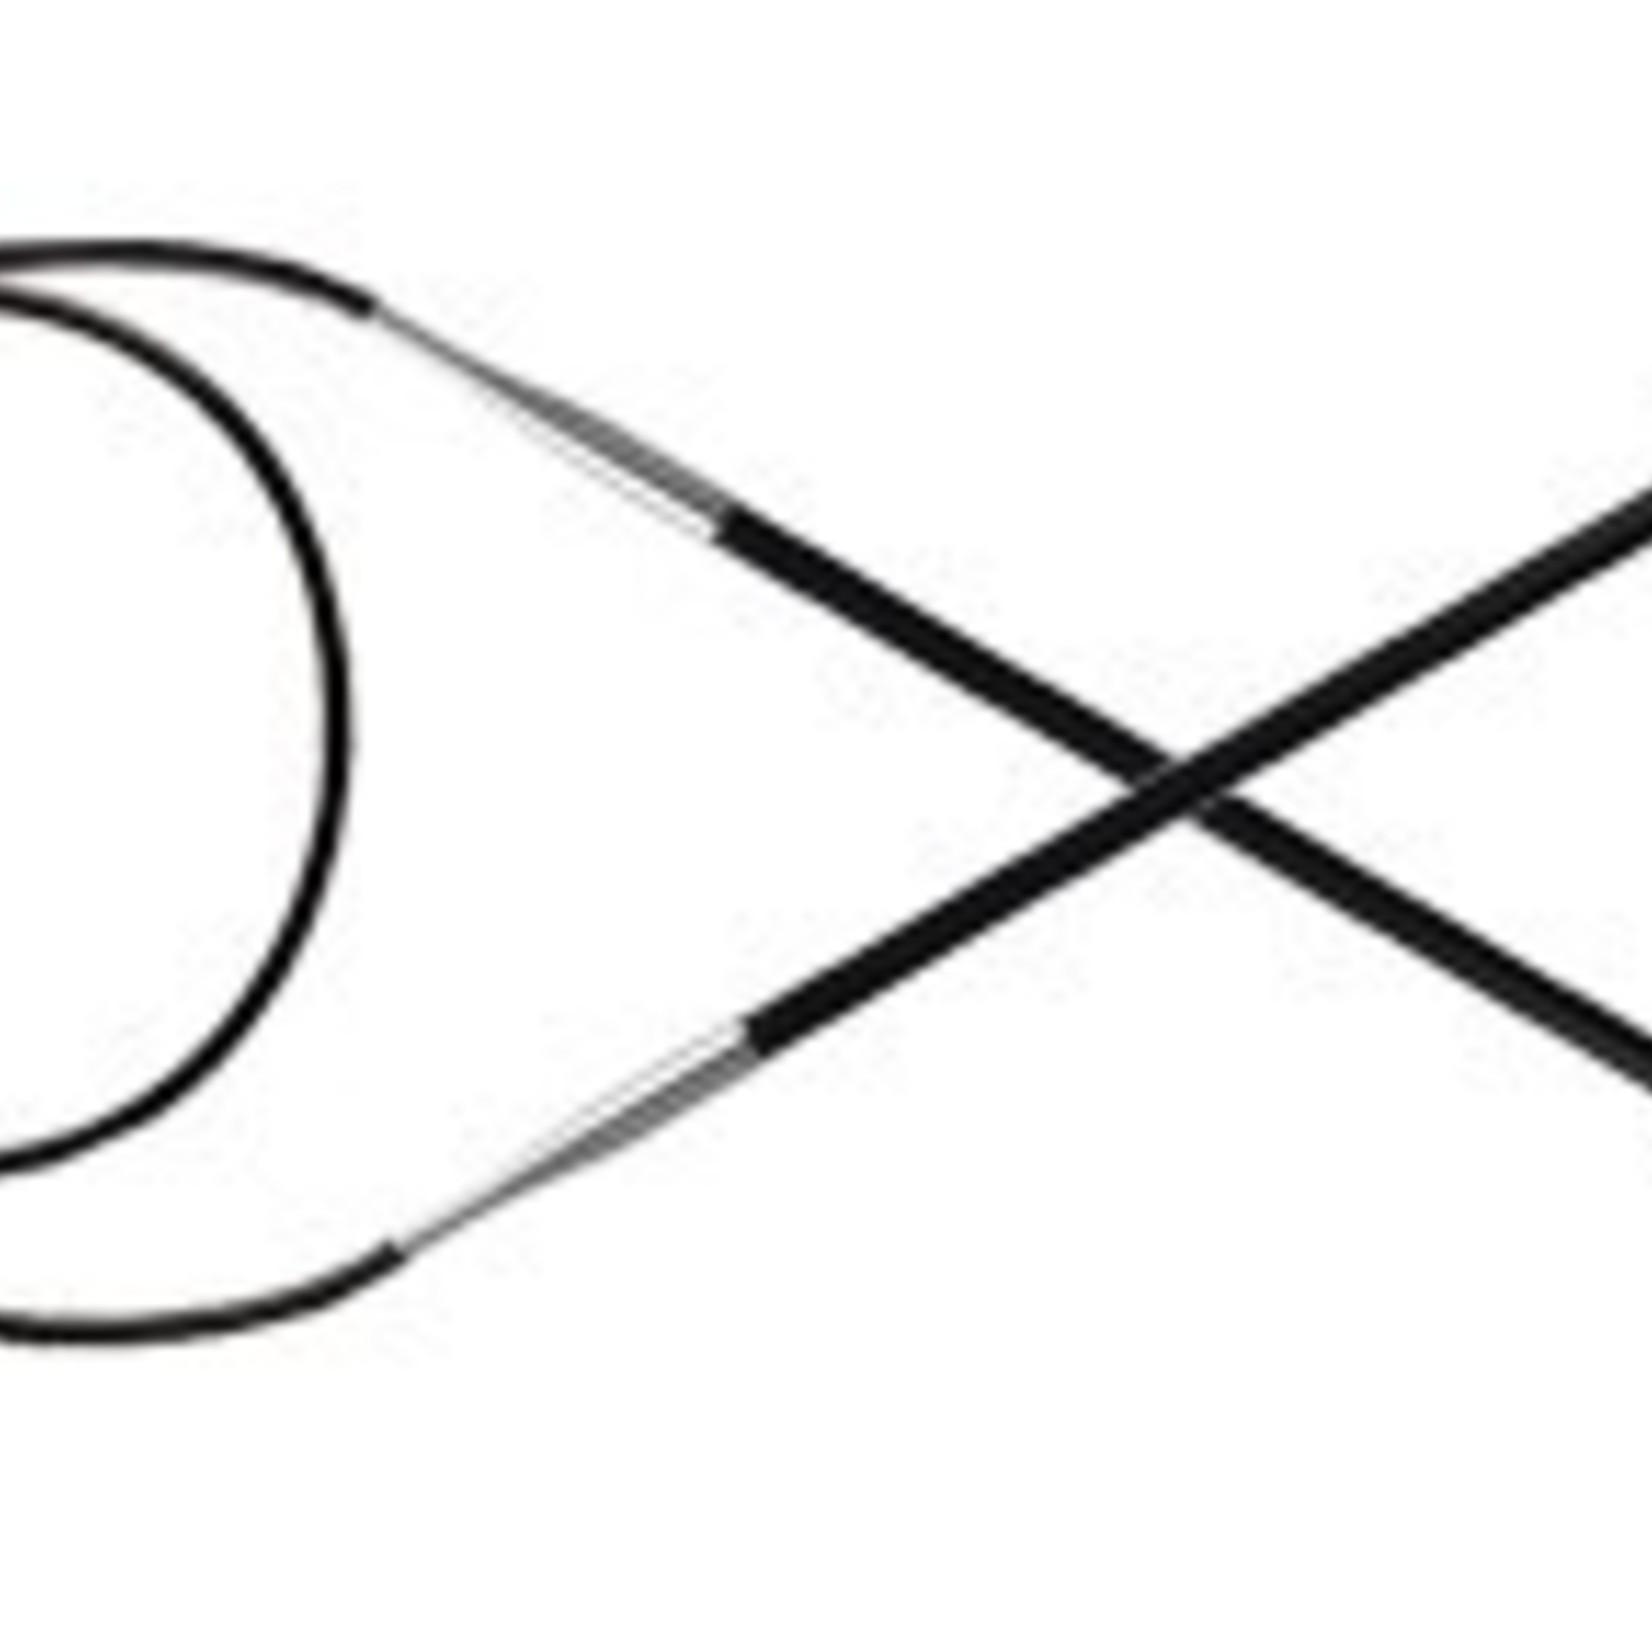 Knitter's Pride 2.5 Karbonz Circular 24